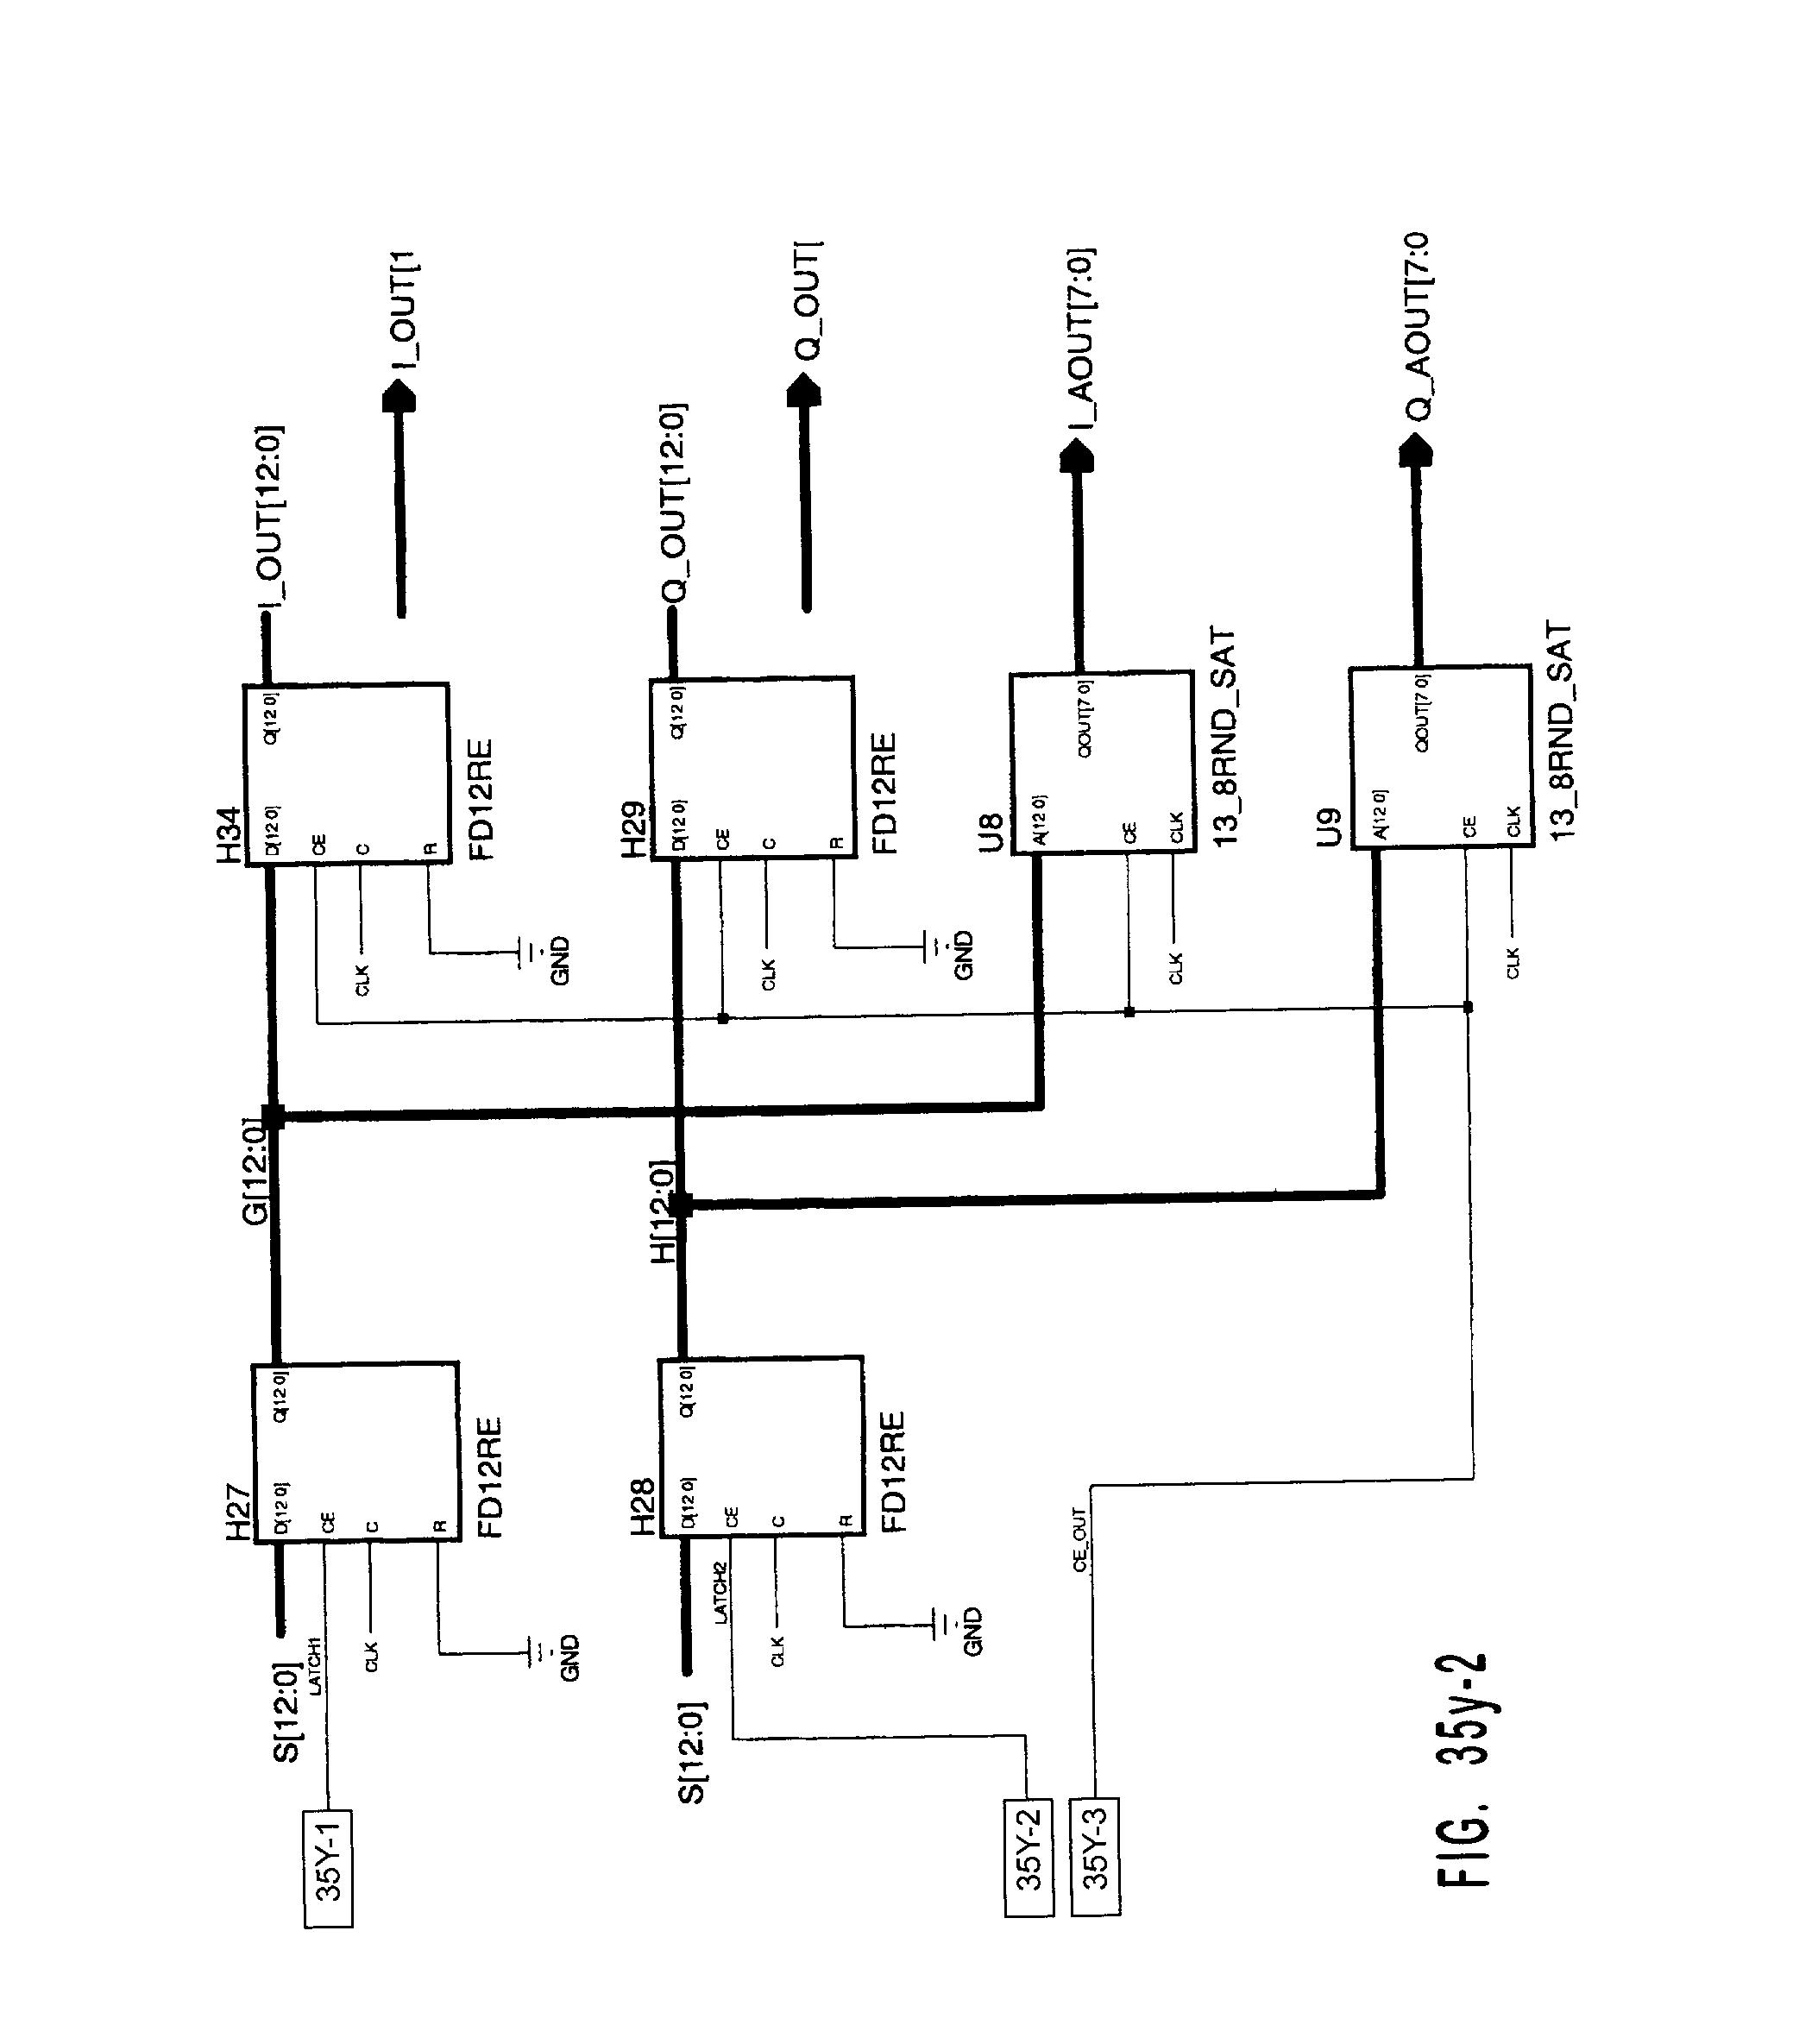 wiring diagram 2003 mercedes ml